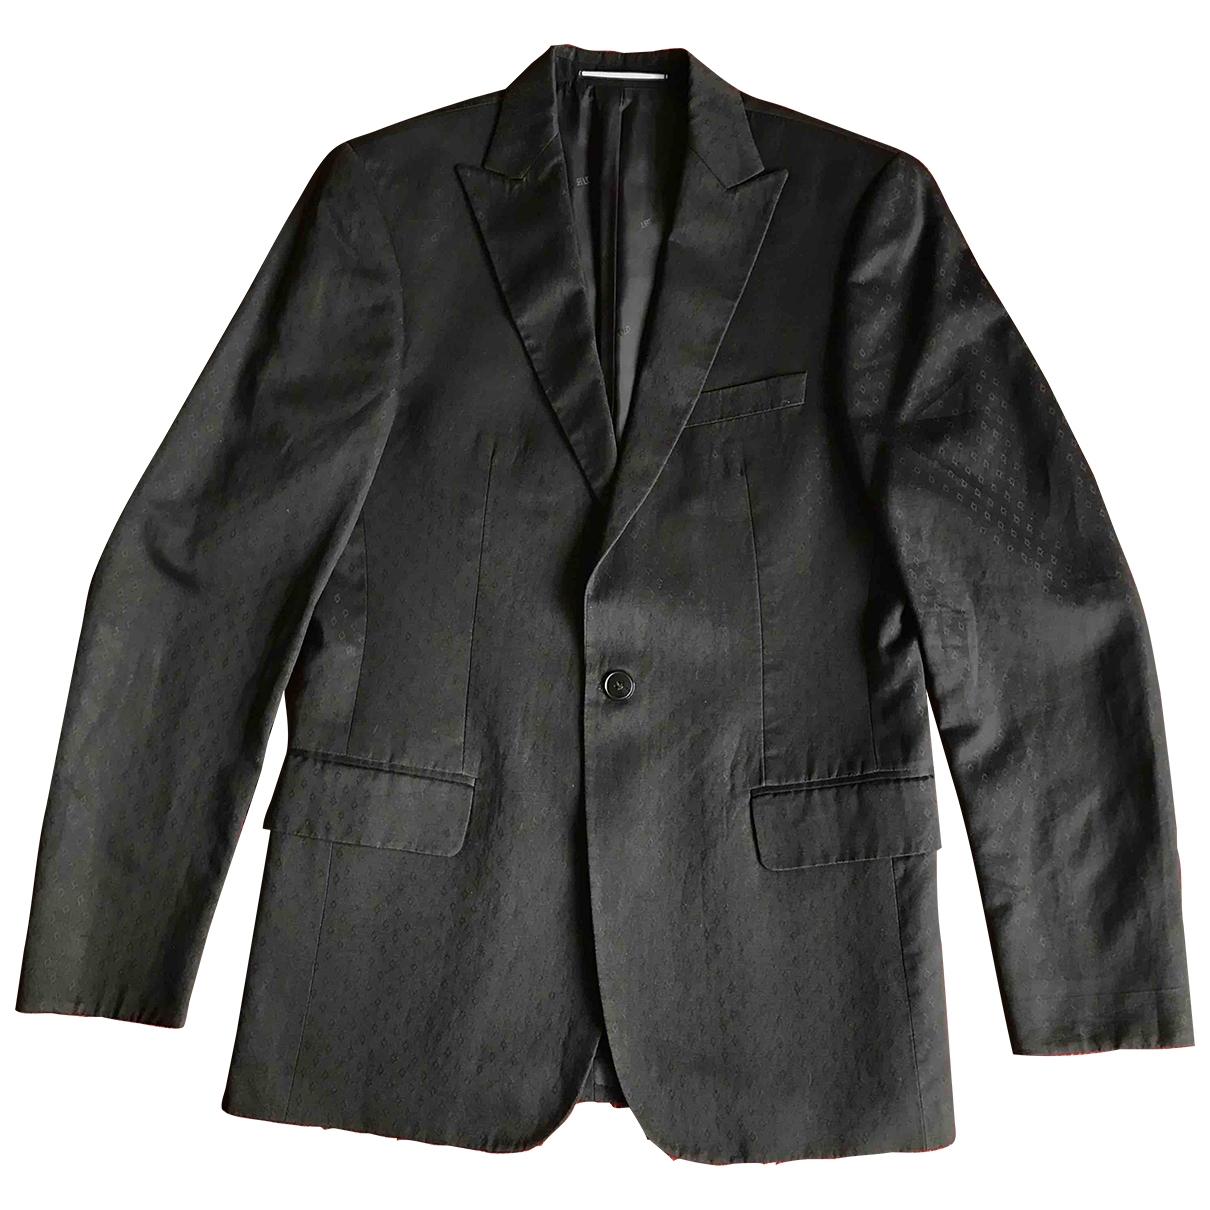 Karl Lagerfeld \N Black Cotton jacket  for Men 48 IT